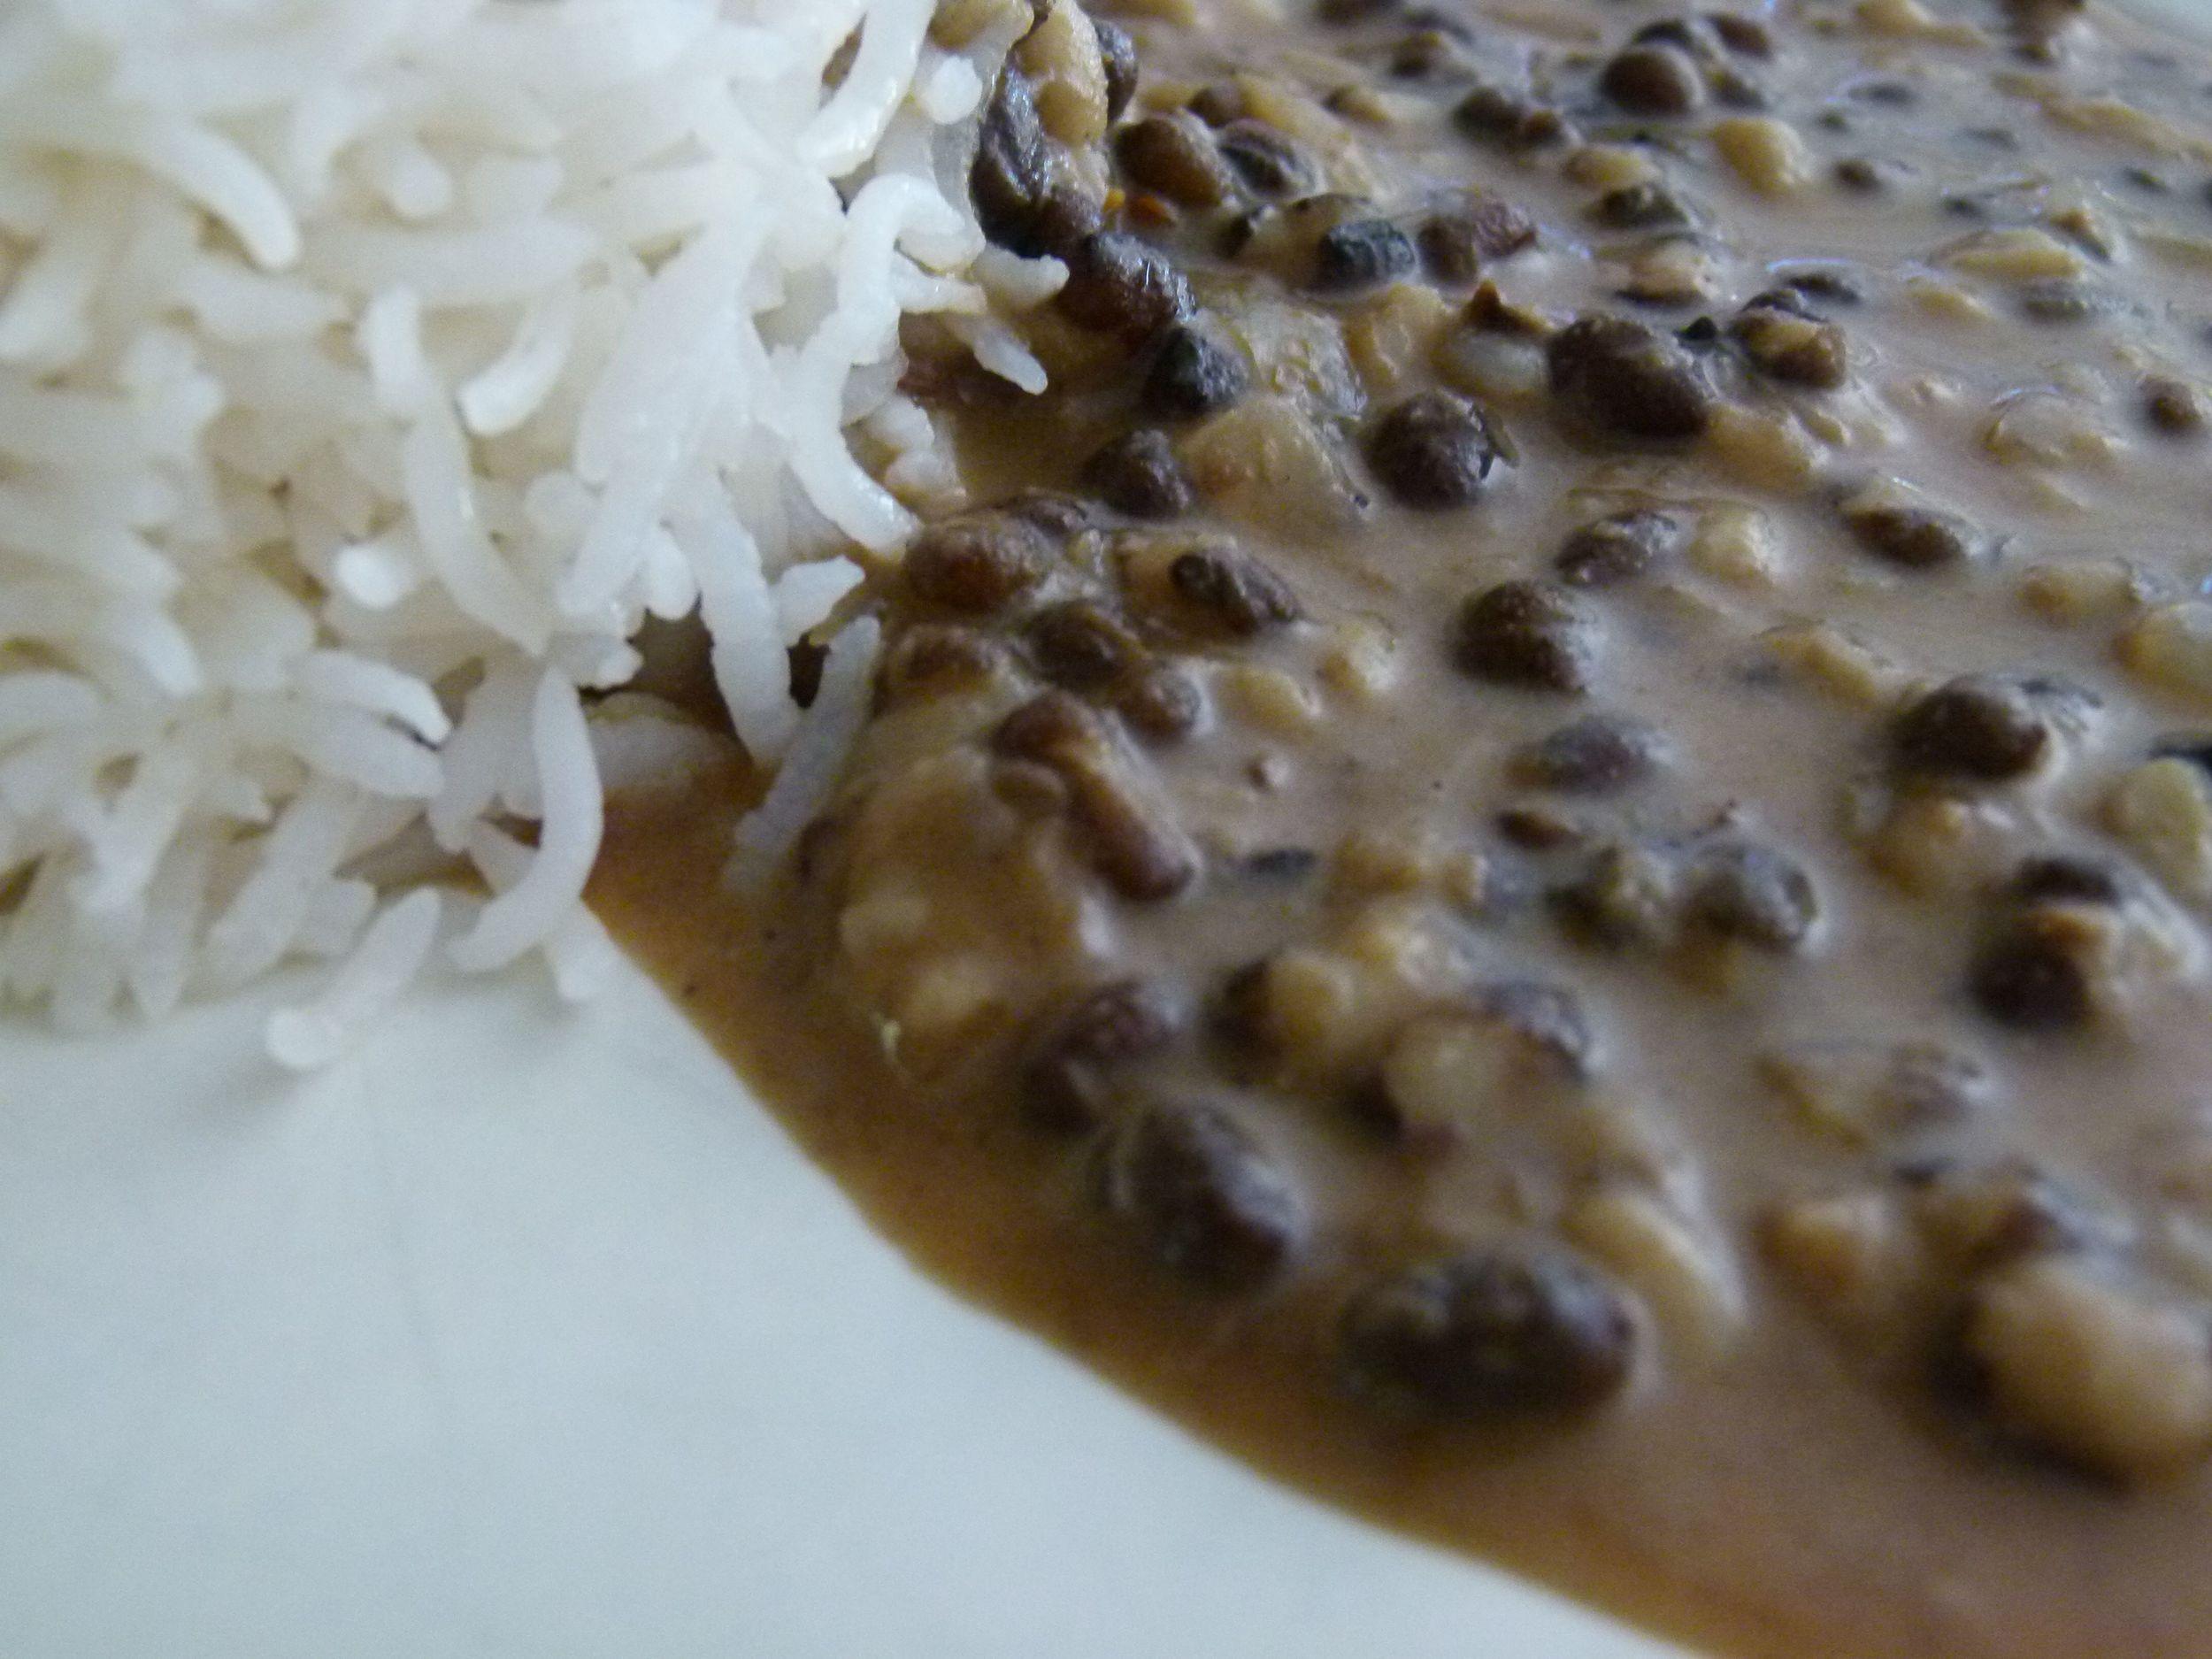 Dal makhani con arroz basmati